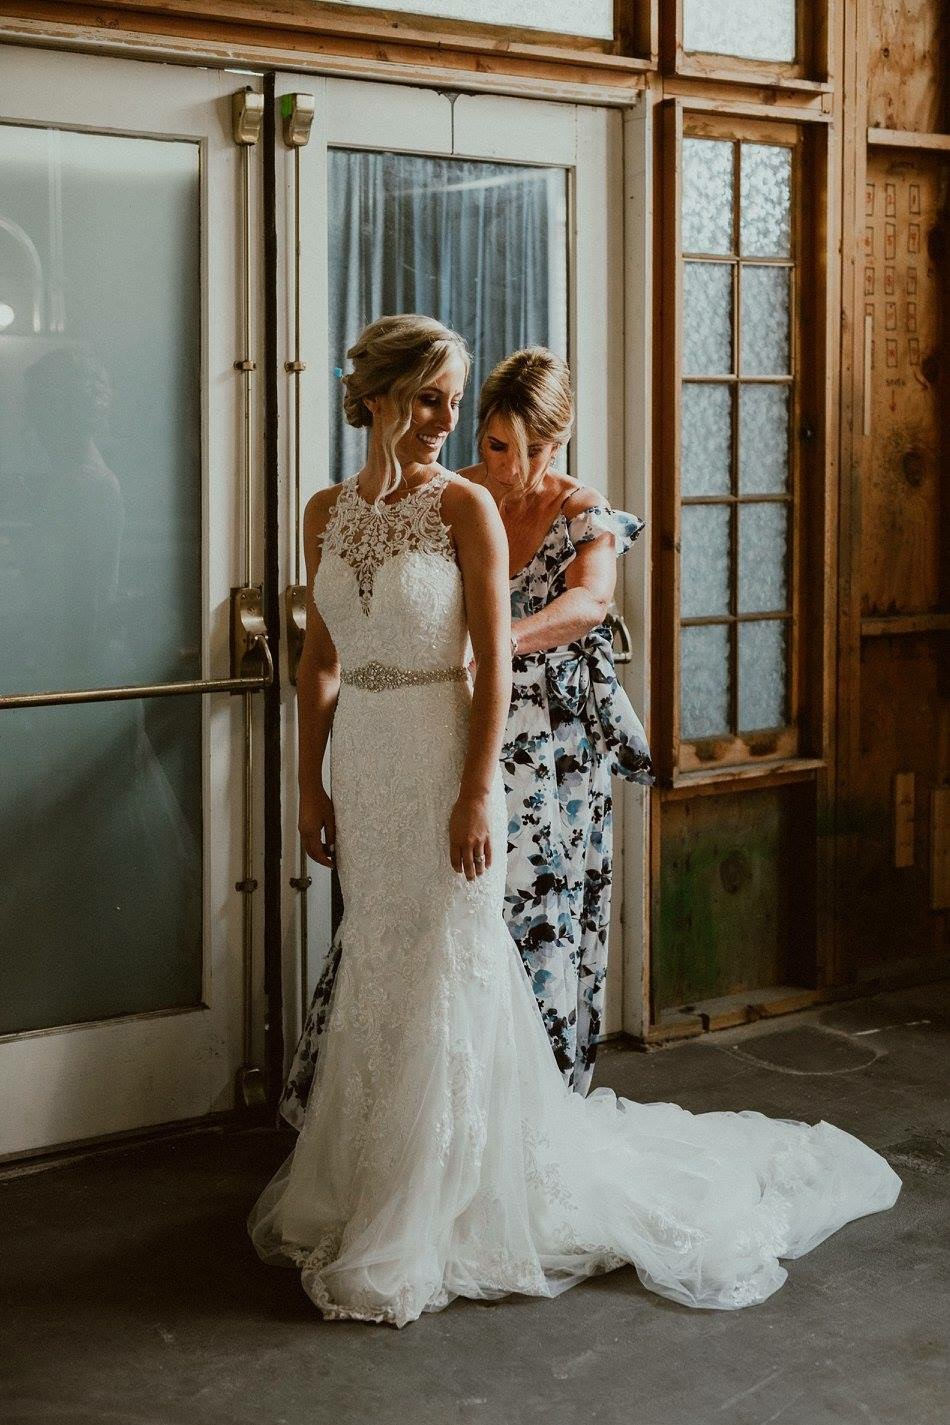 Bridal Curled Hair Updo.JPG